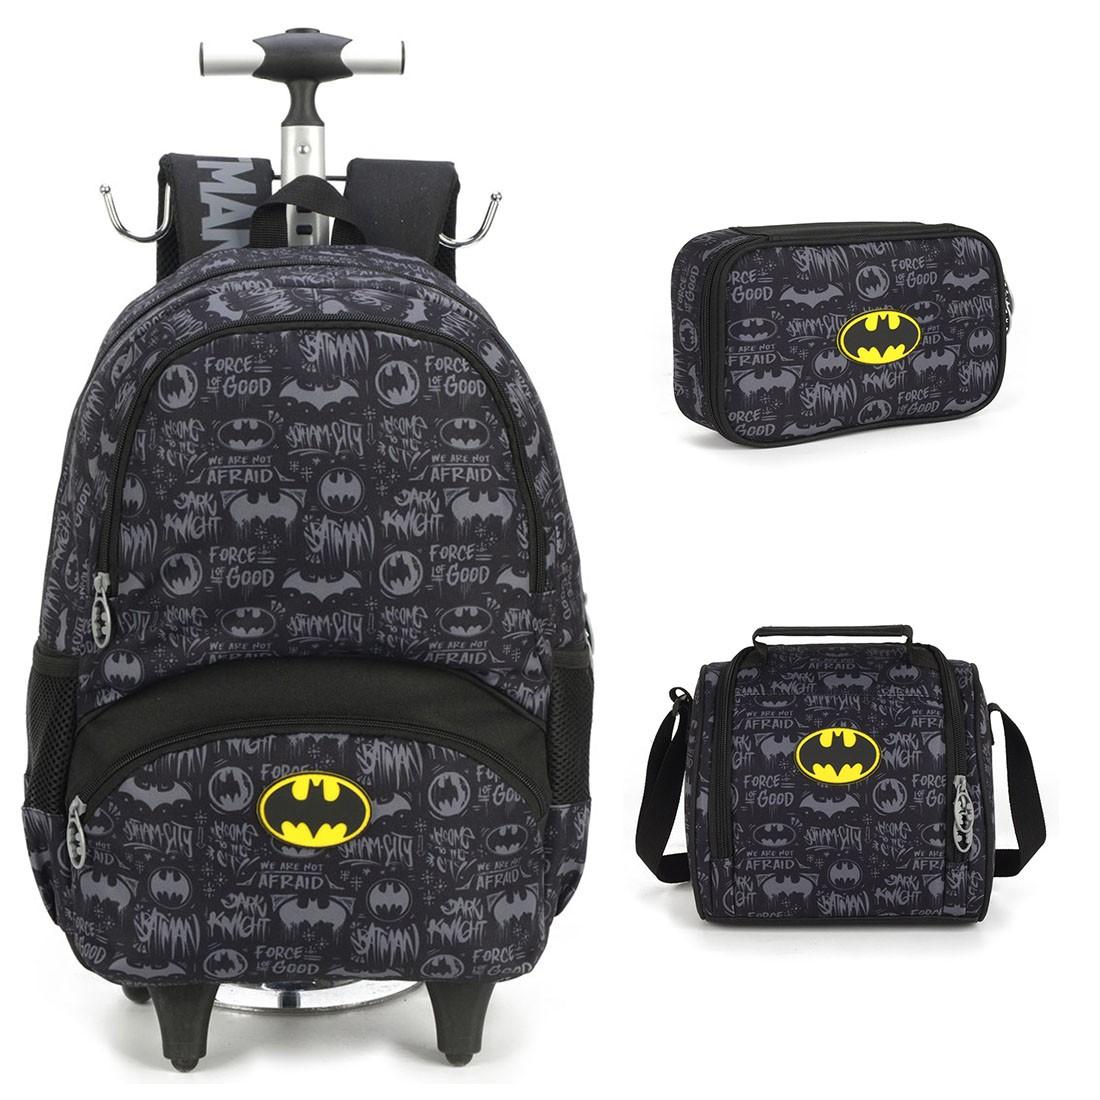 Kit Mochila Infantil Batman com Lancheira e Estojo 100 Pens